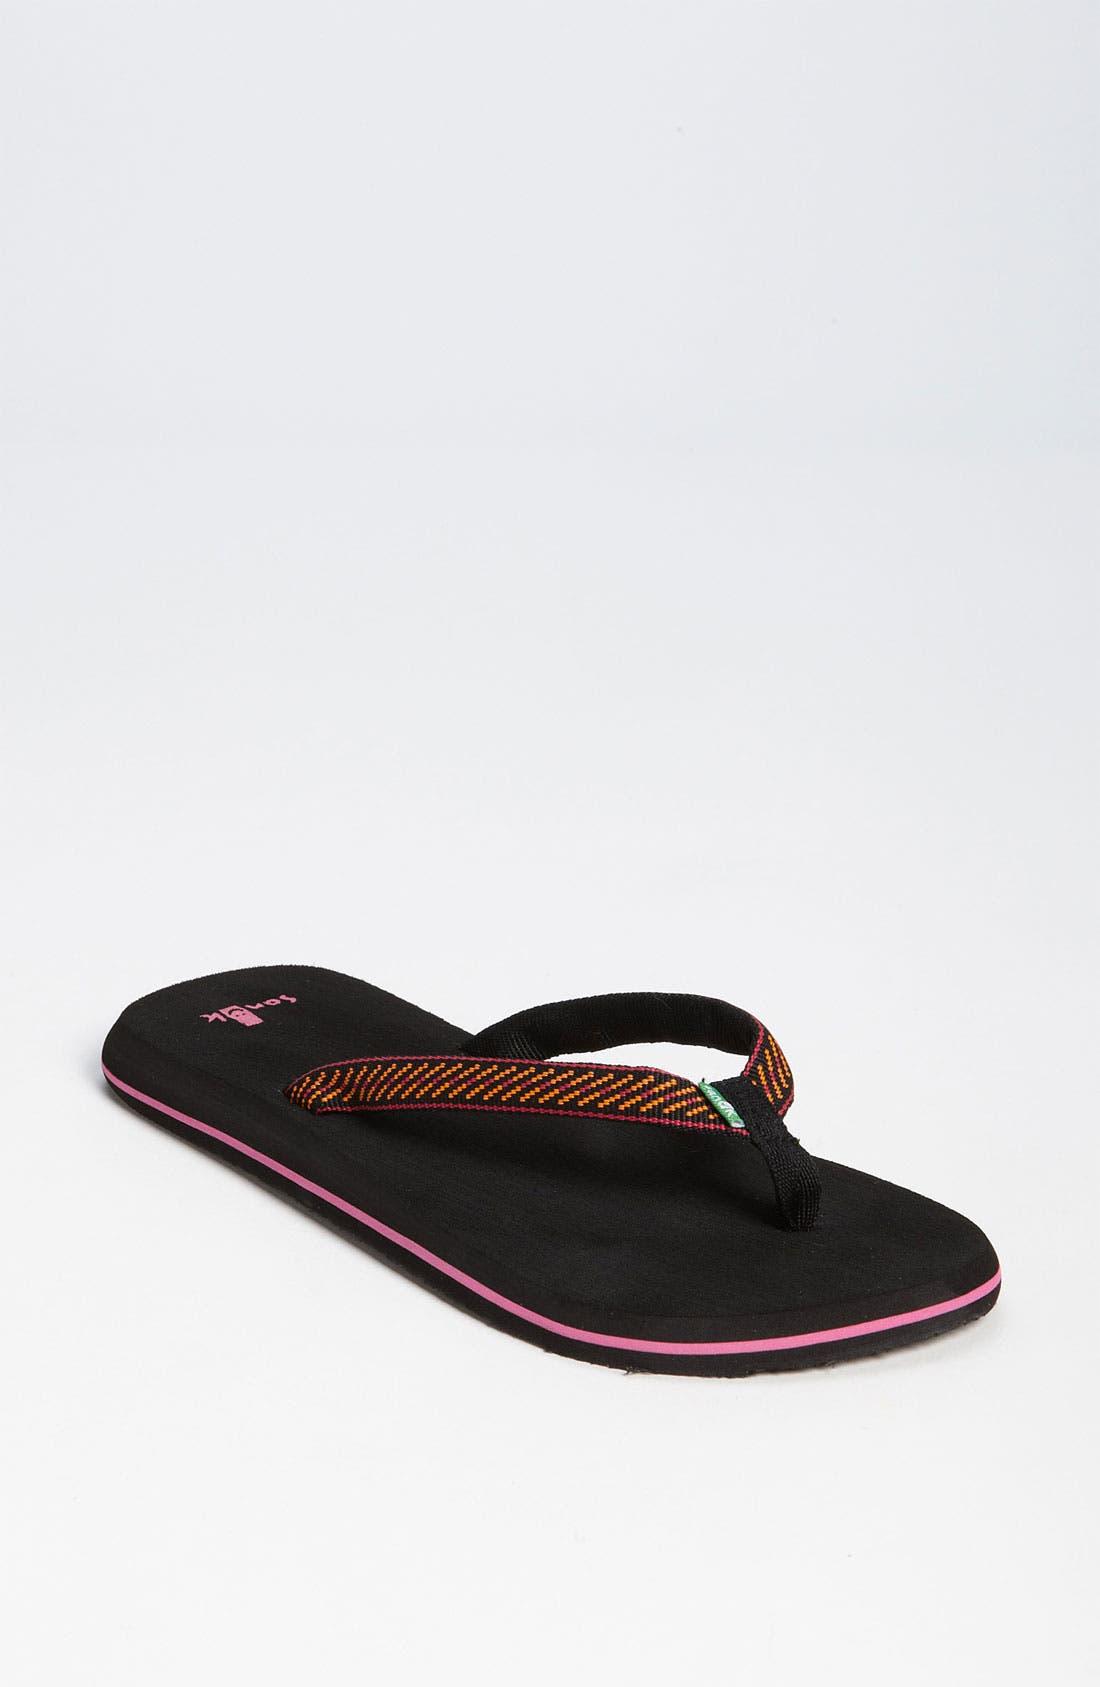 Main Image - Sanuk 'Sandpiper' Flip Flop